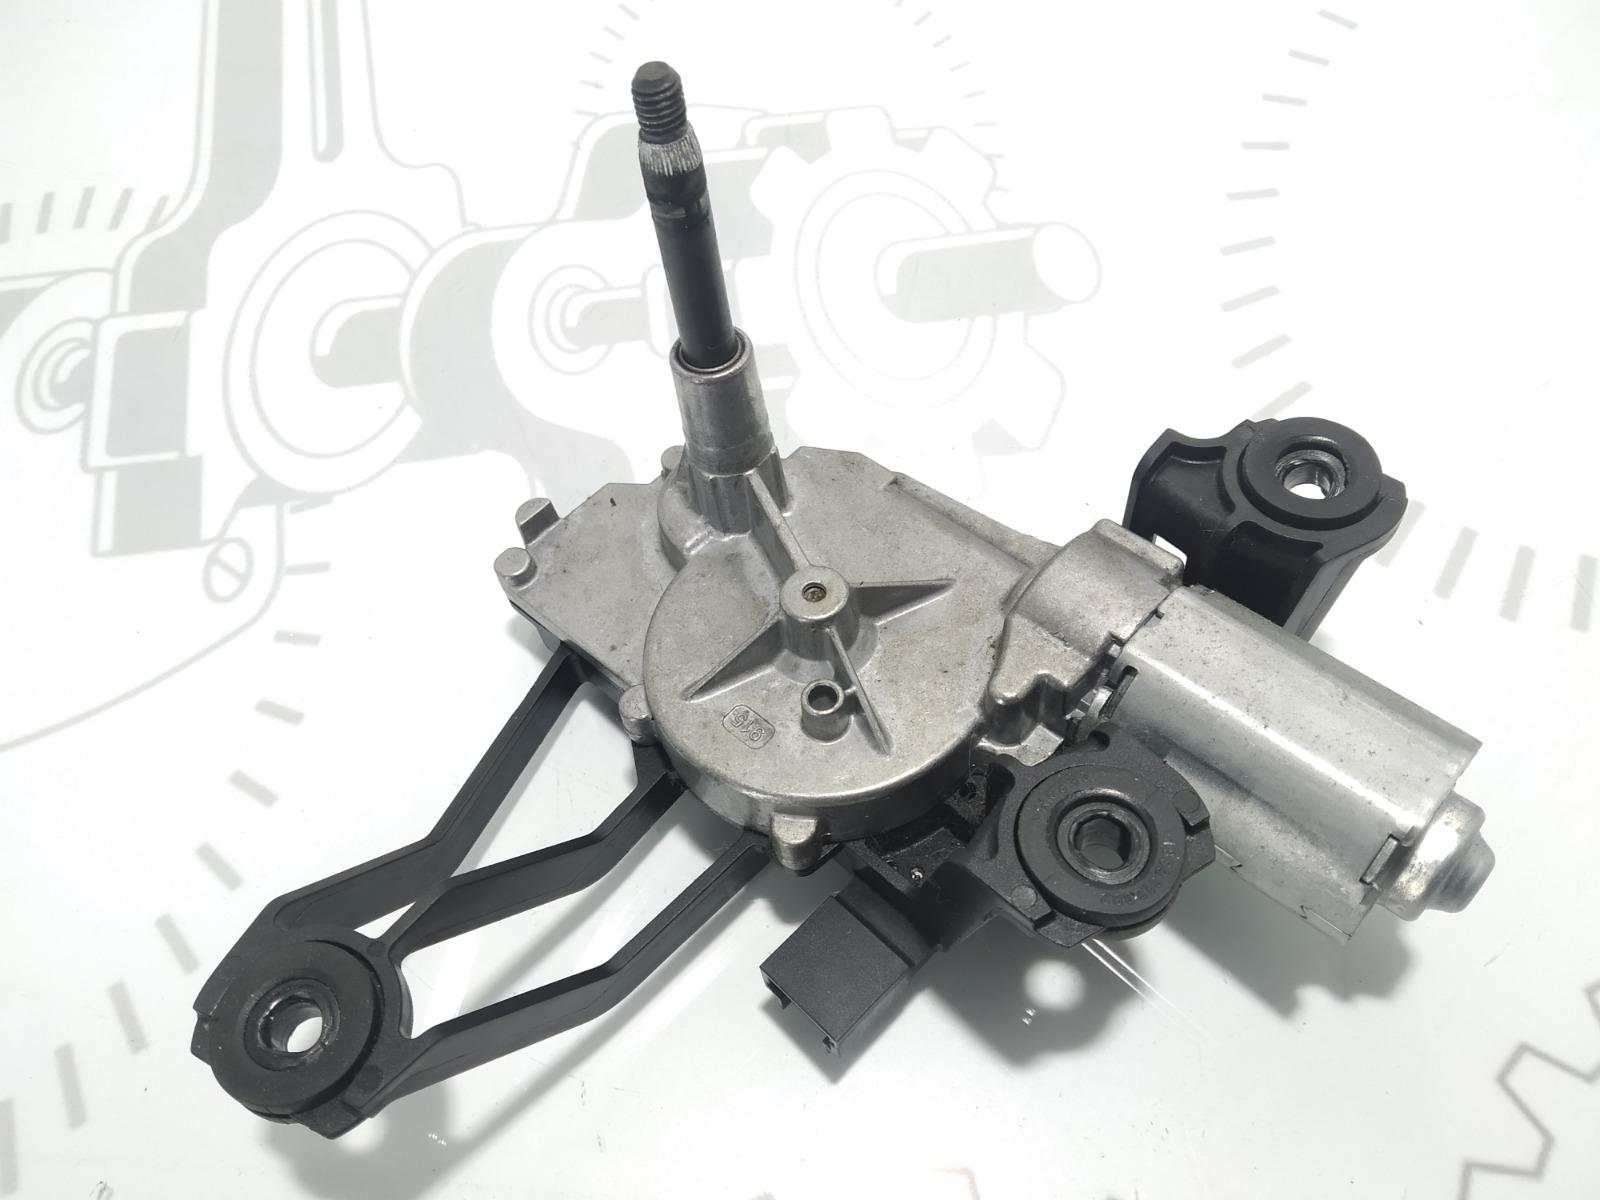 Моторчик заднего стеклоочистителя (дворника) Citroen C4 Grand Picasso 1.6 HDI 2008 (б/у)